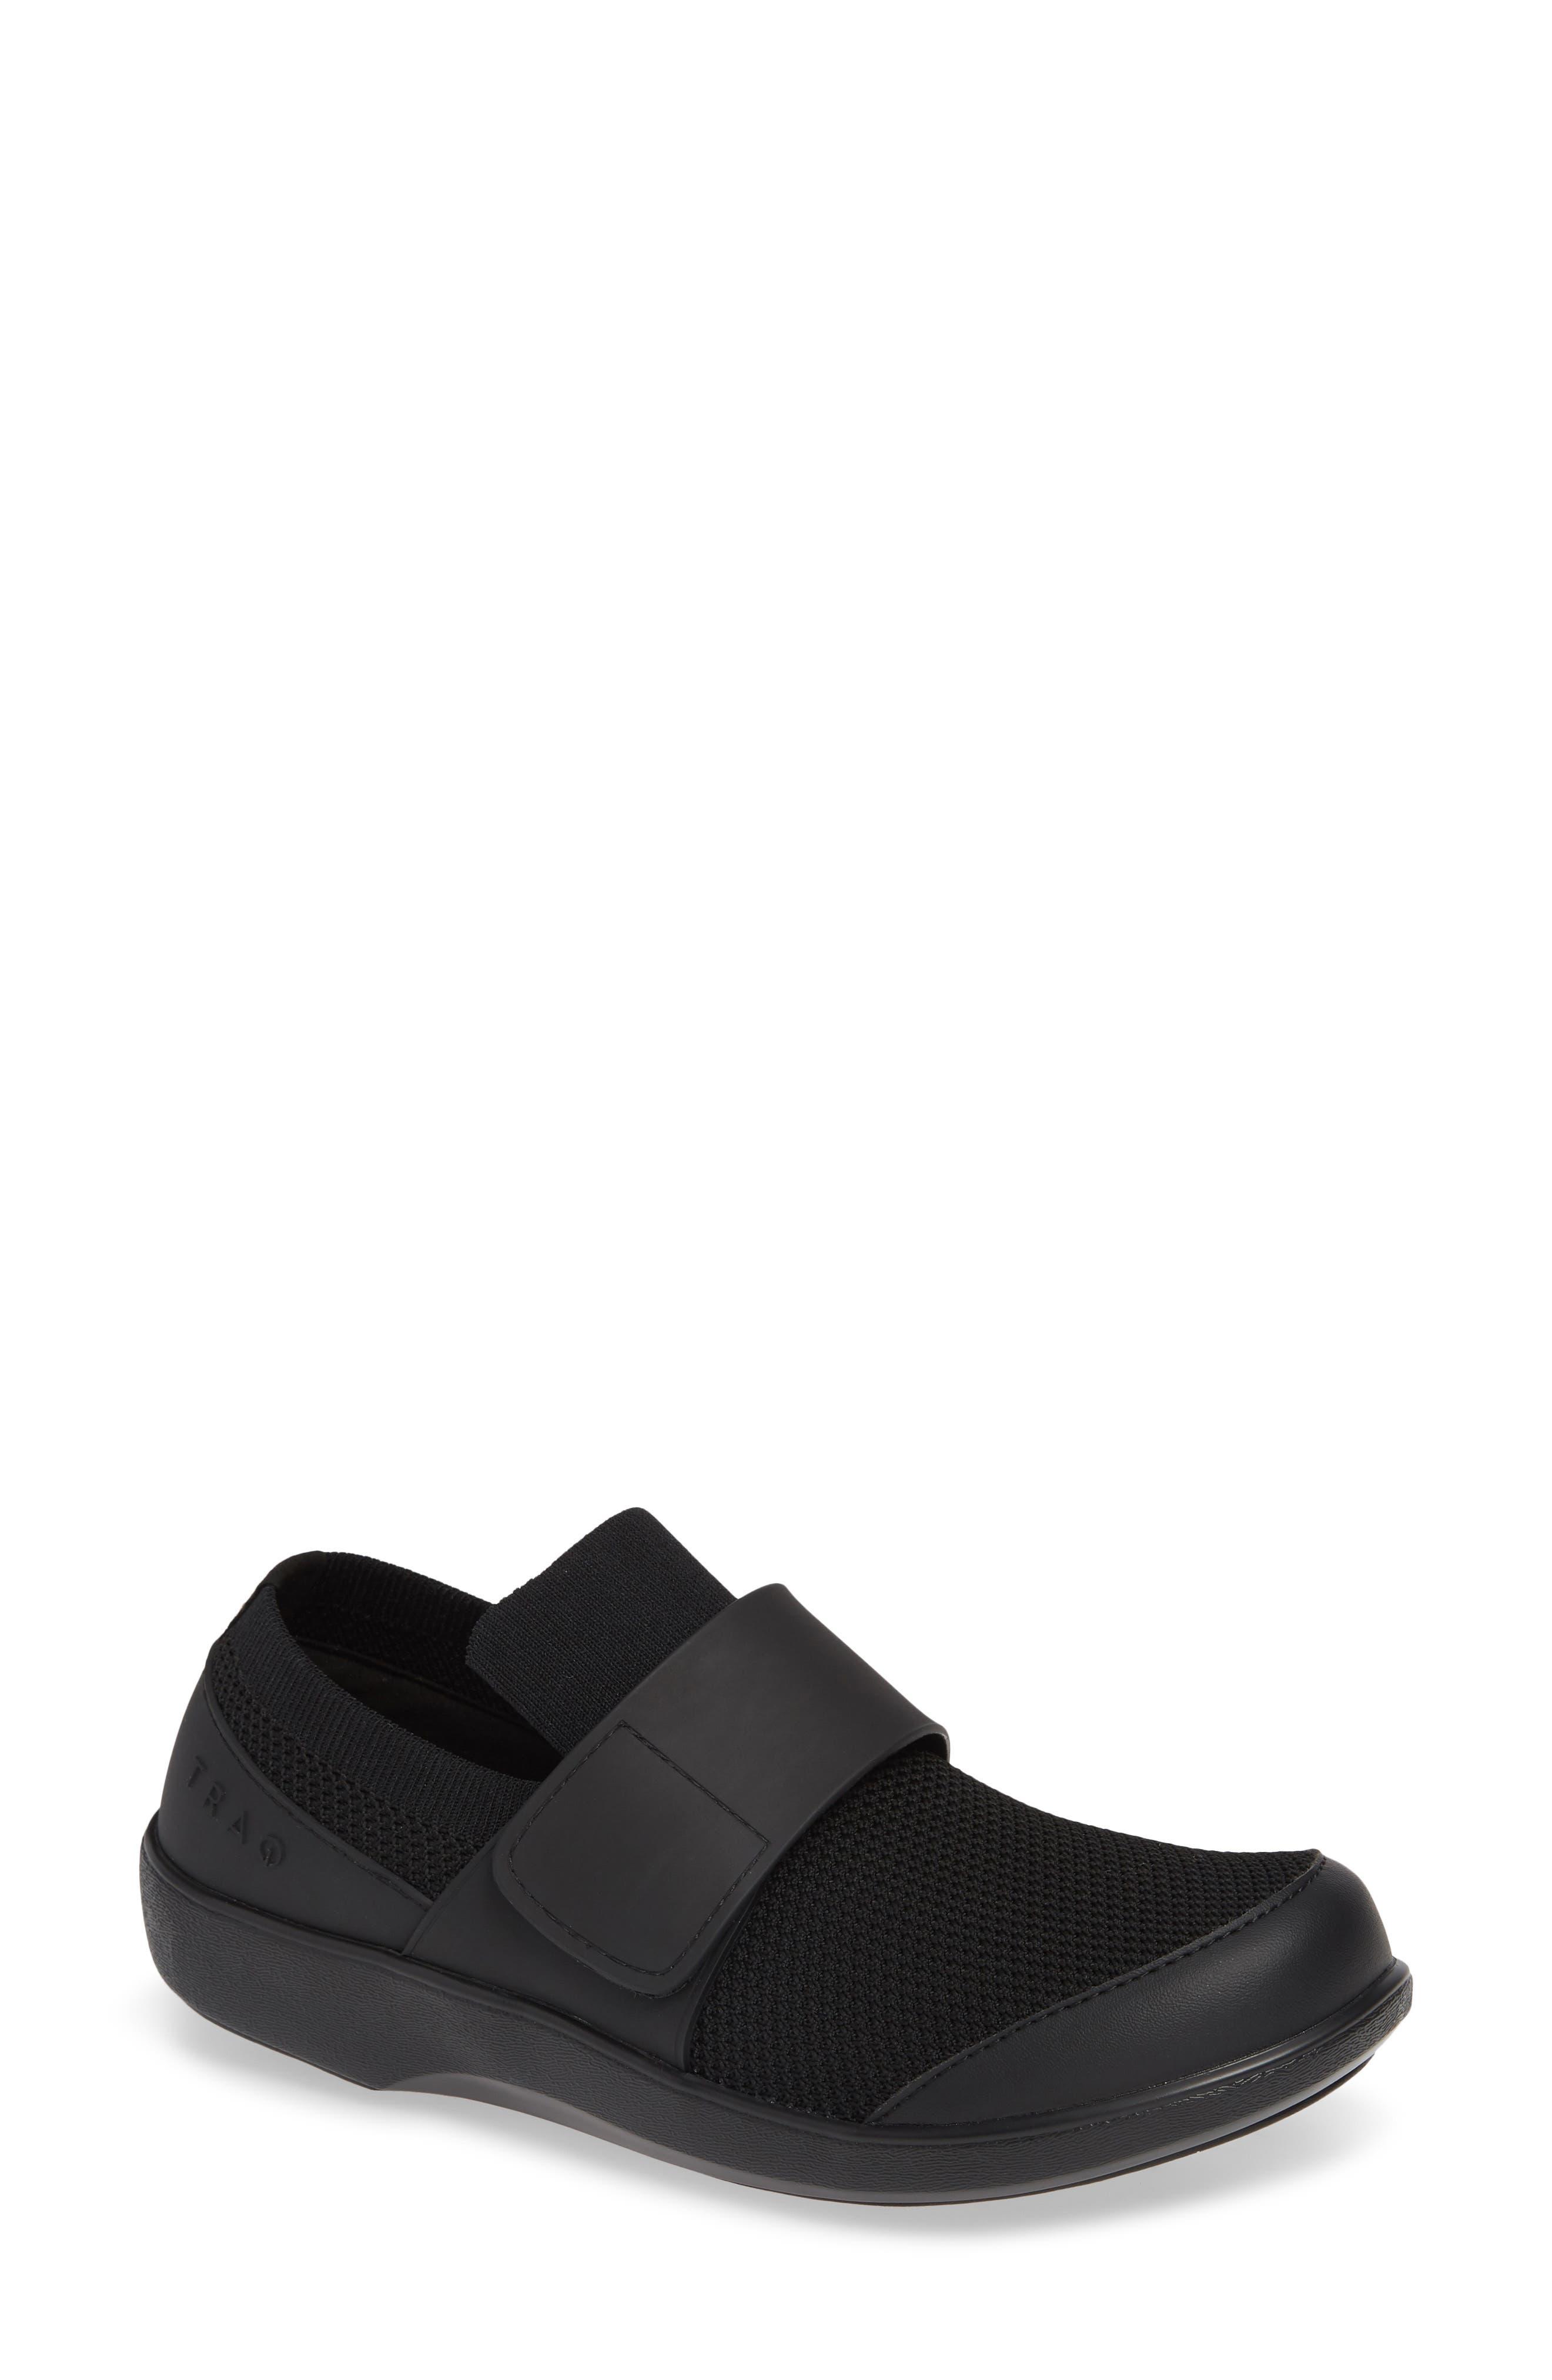 Alegria Qwik Sneaker, Black